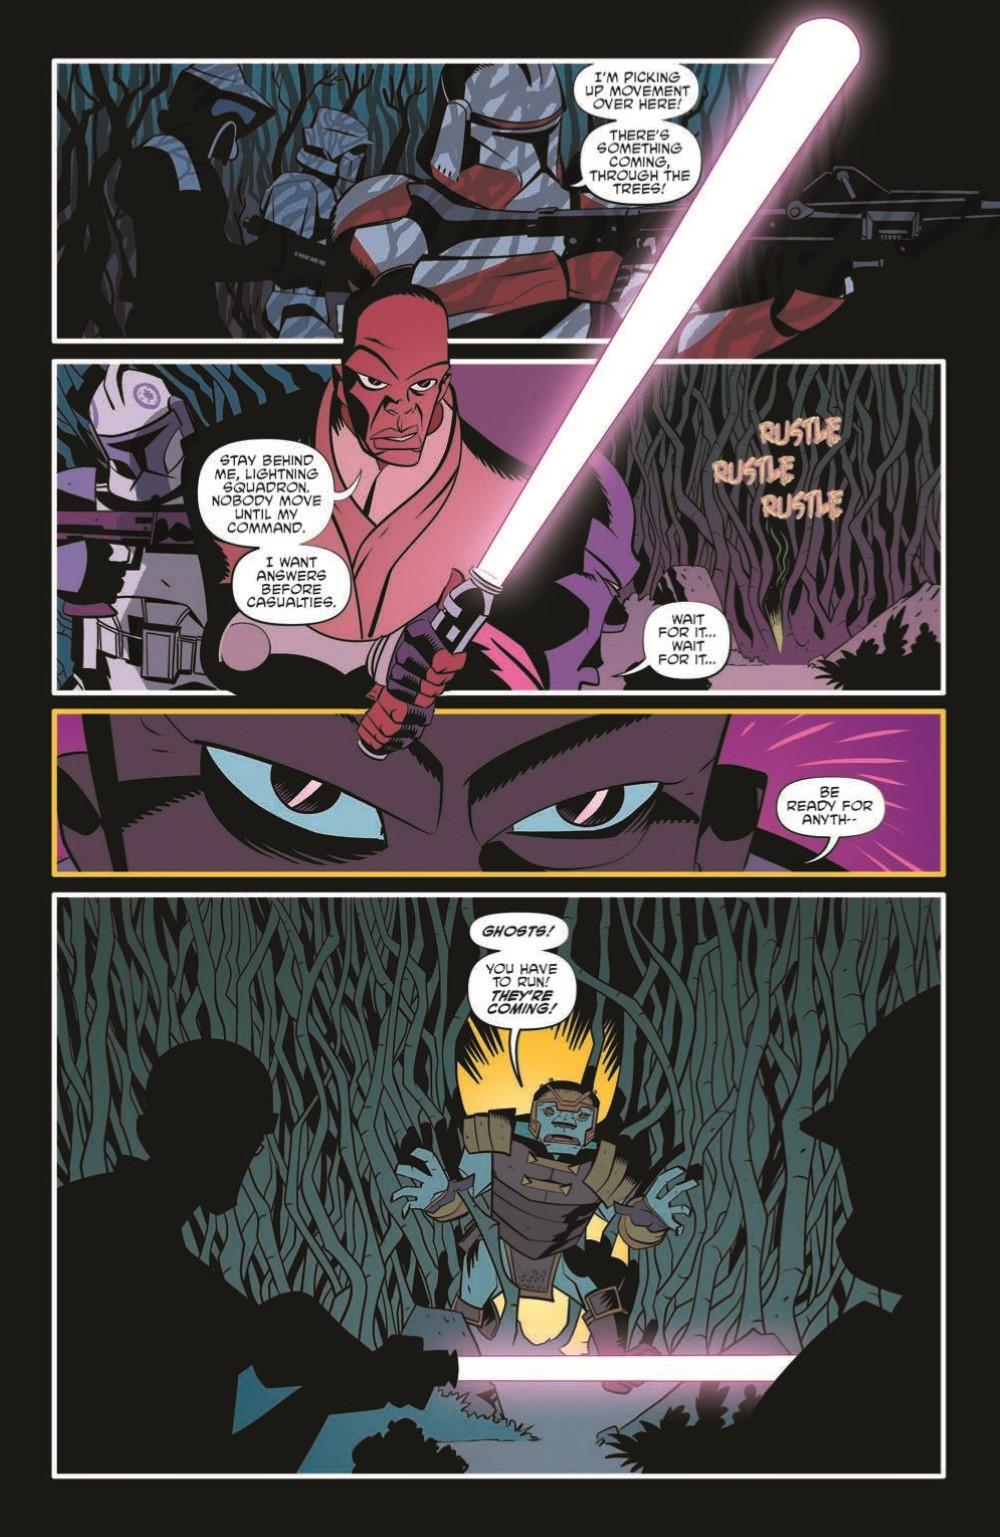 StarWarsAdv09-pr-5 ComicList Previews: STAR WARS ADVENTURES VOLUME 2 #9